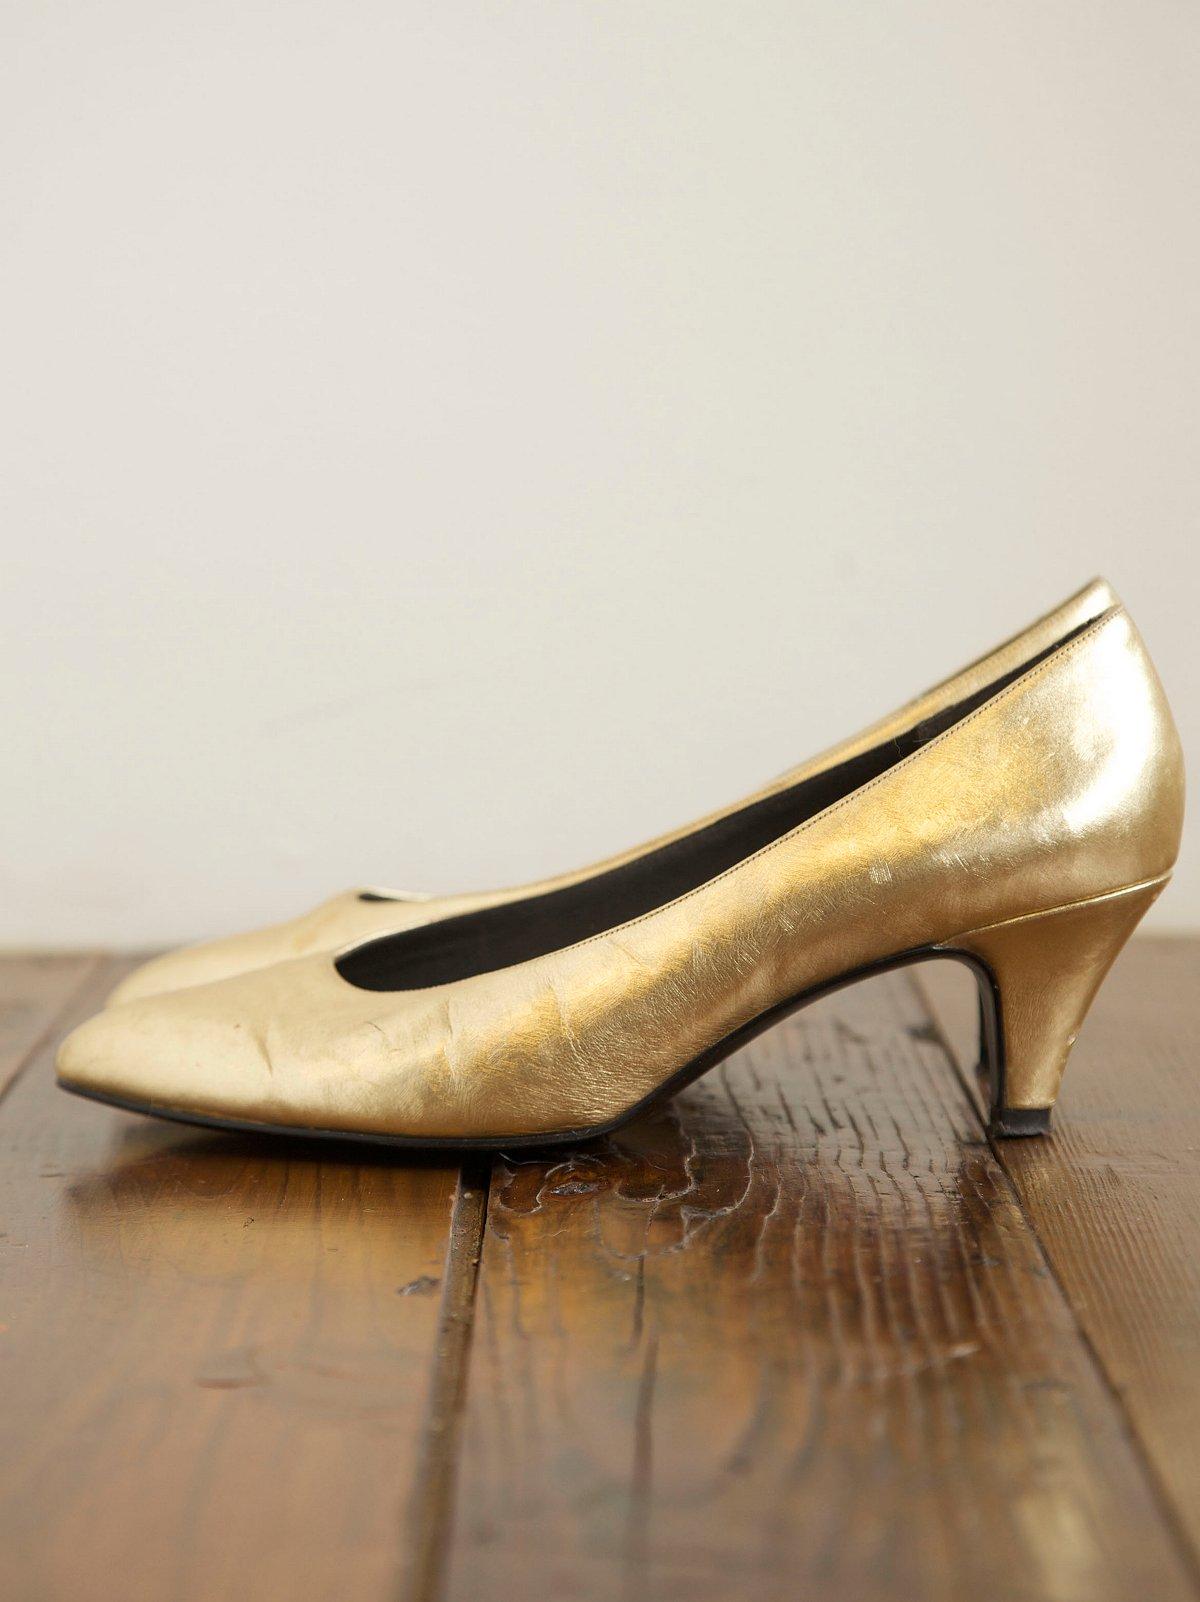 Vintage Gold Heels